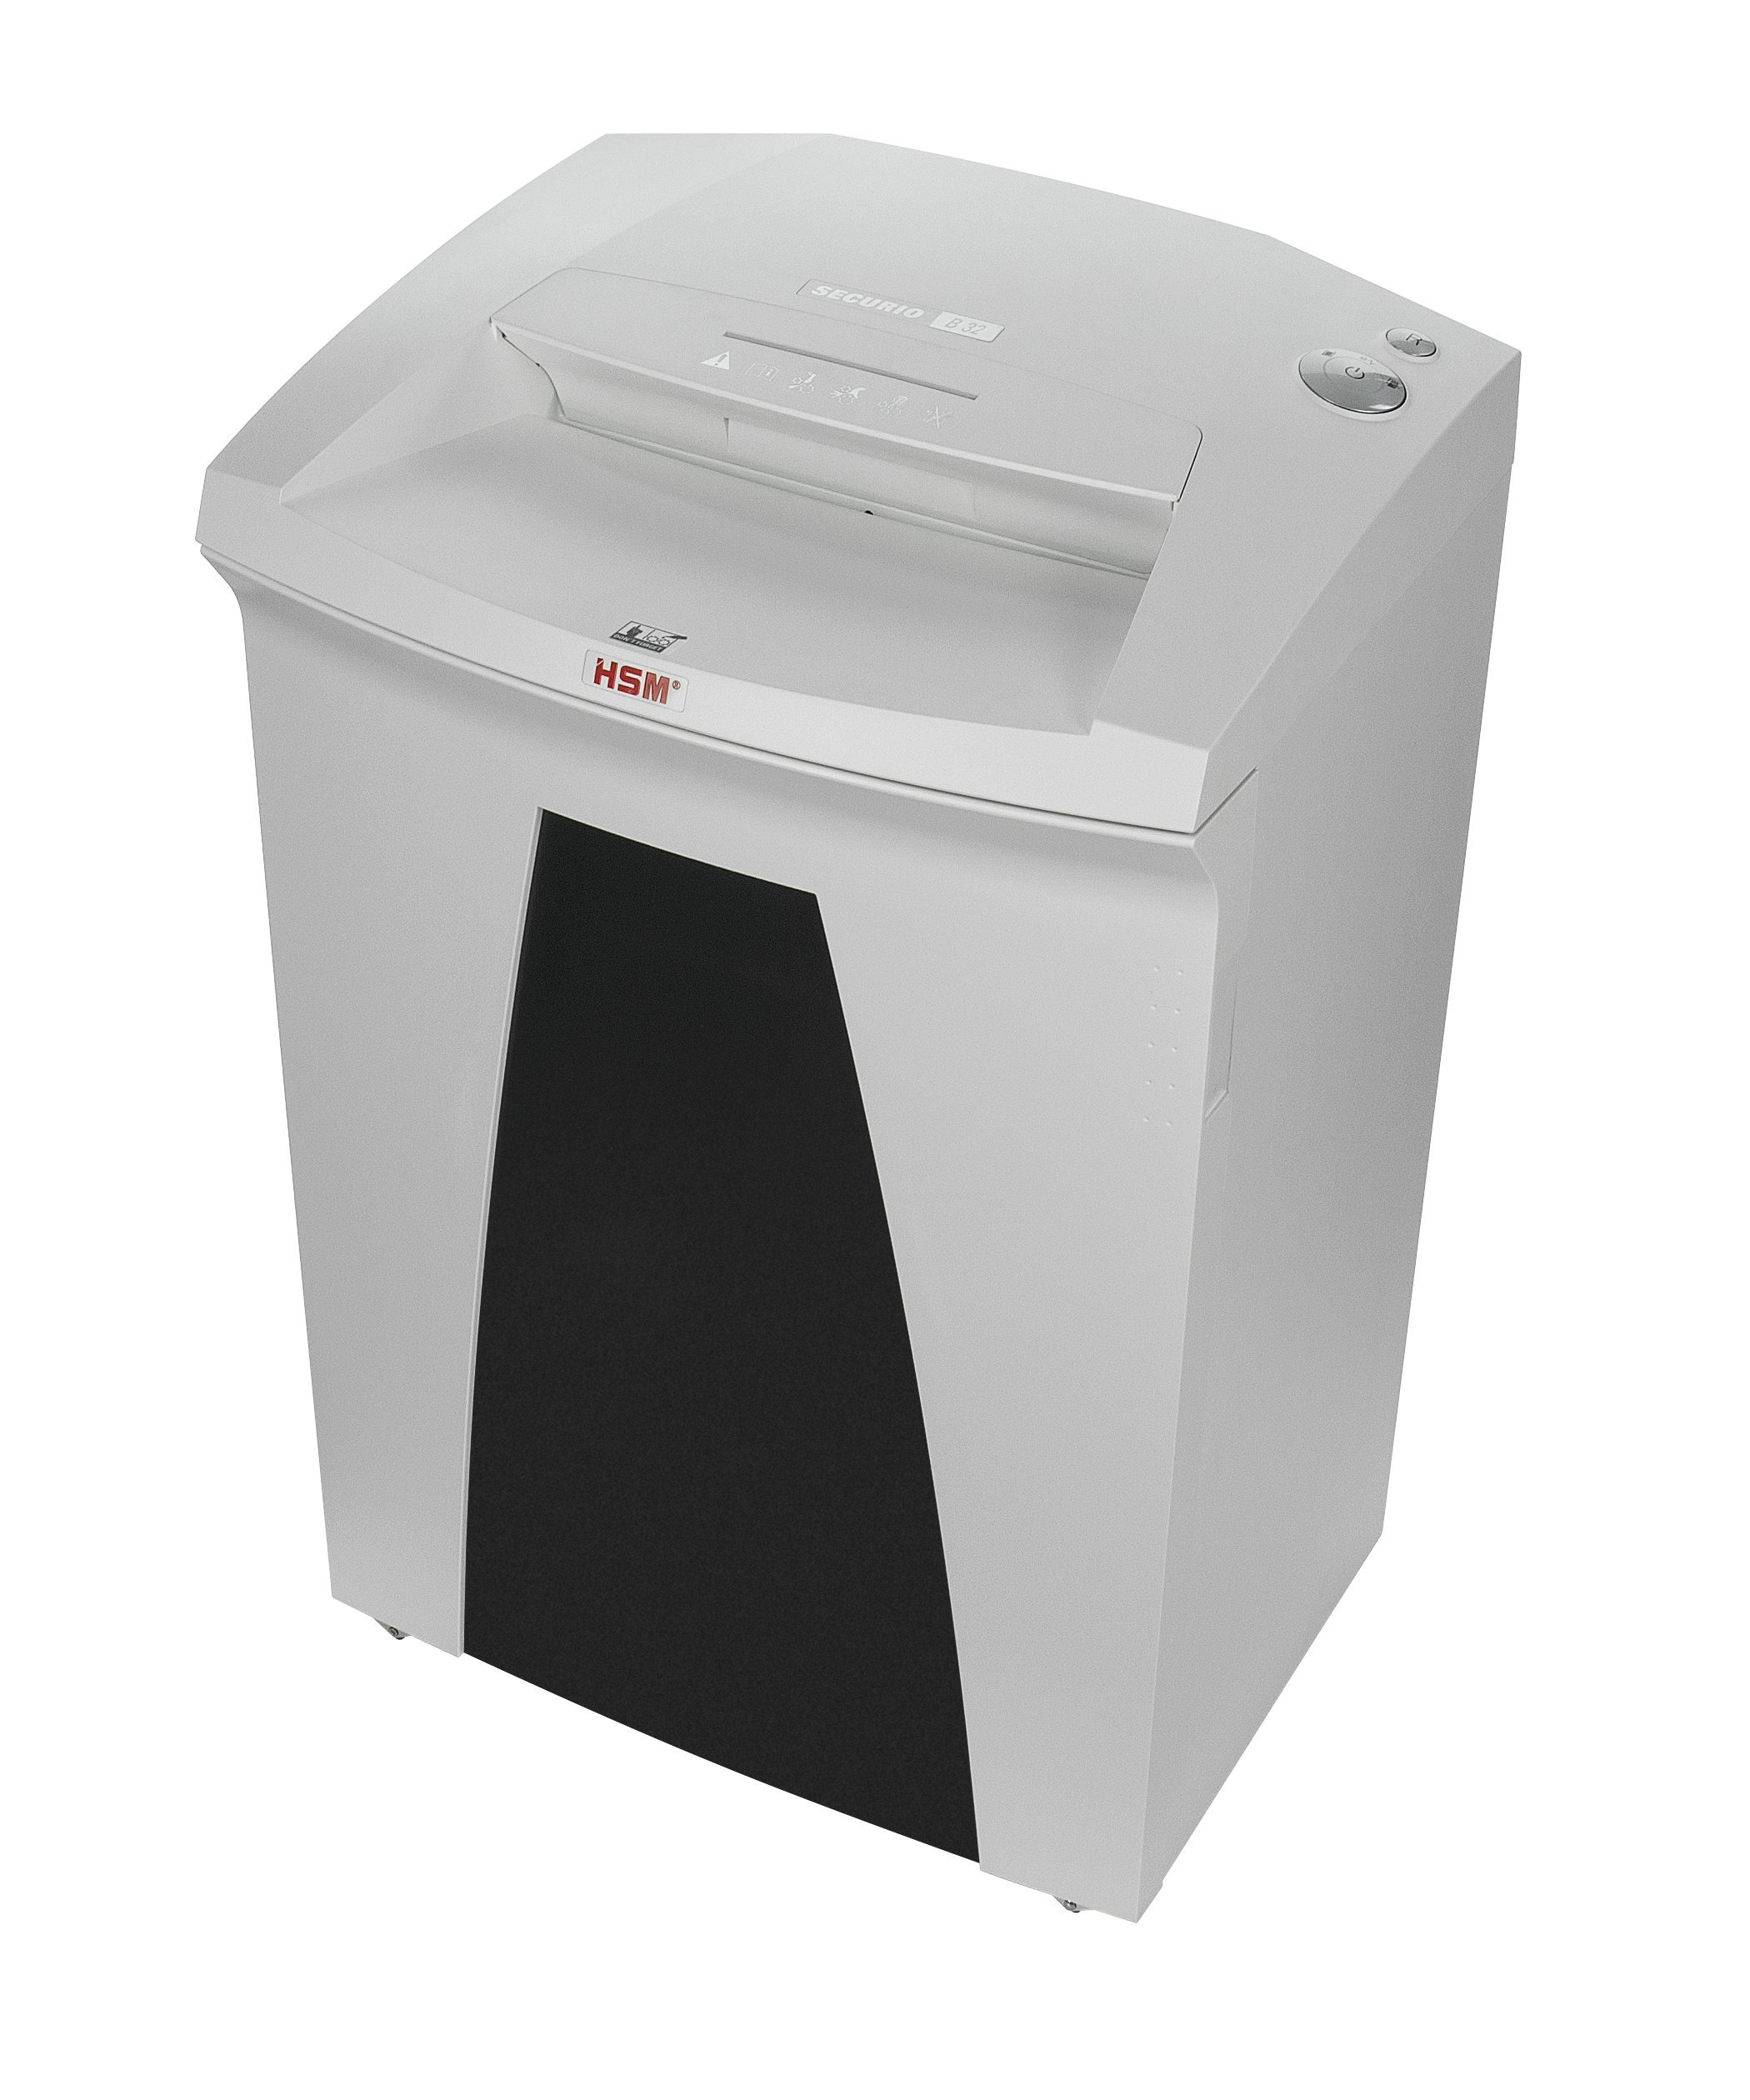 HSM SECURIO B32c, 17-19 Sheets, Cross-Cut, 21.7-Gallon Capacity Shredder